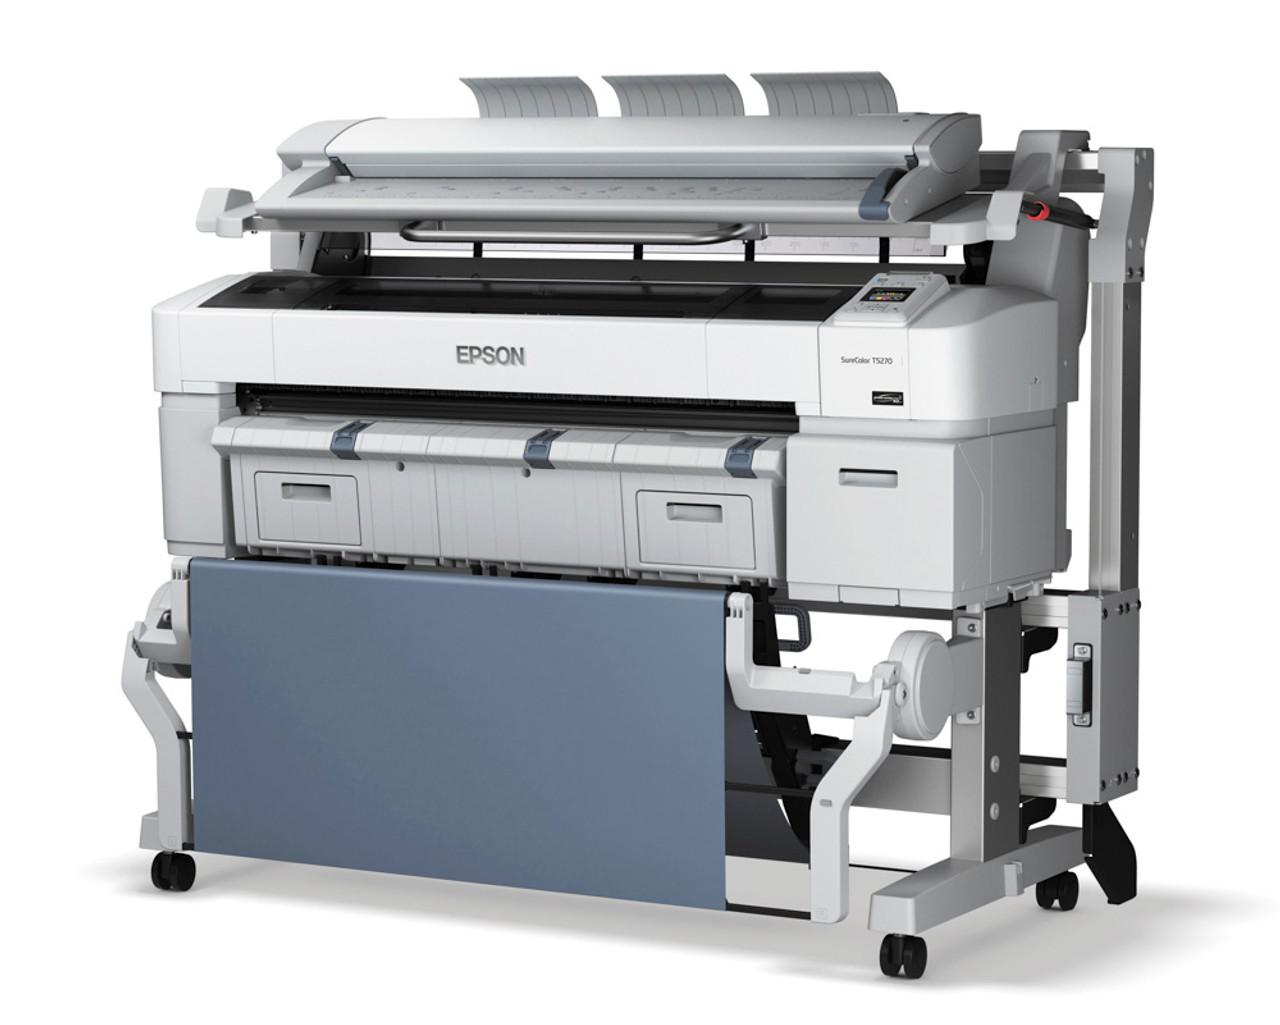 "Epson SureColor T5270 36"" Large- Format Inkjet Printer with MFP option"